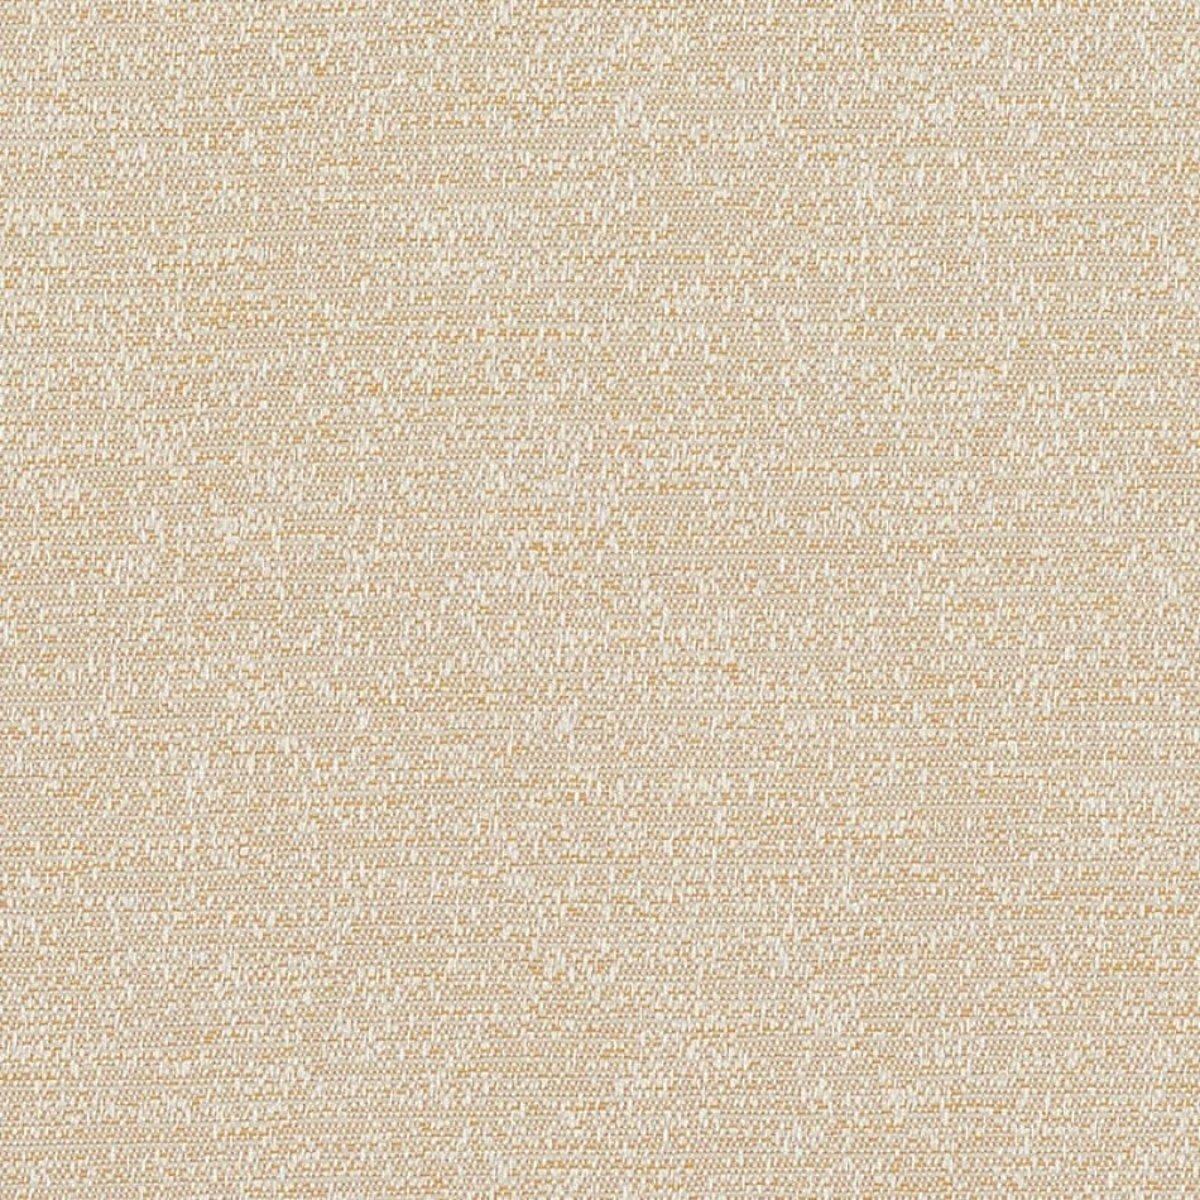 SUNBRELLA palazzo straw stof kopen